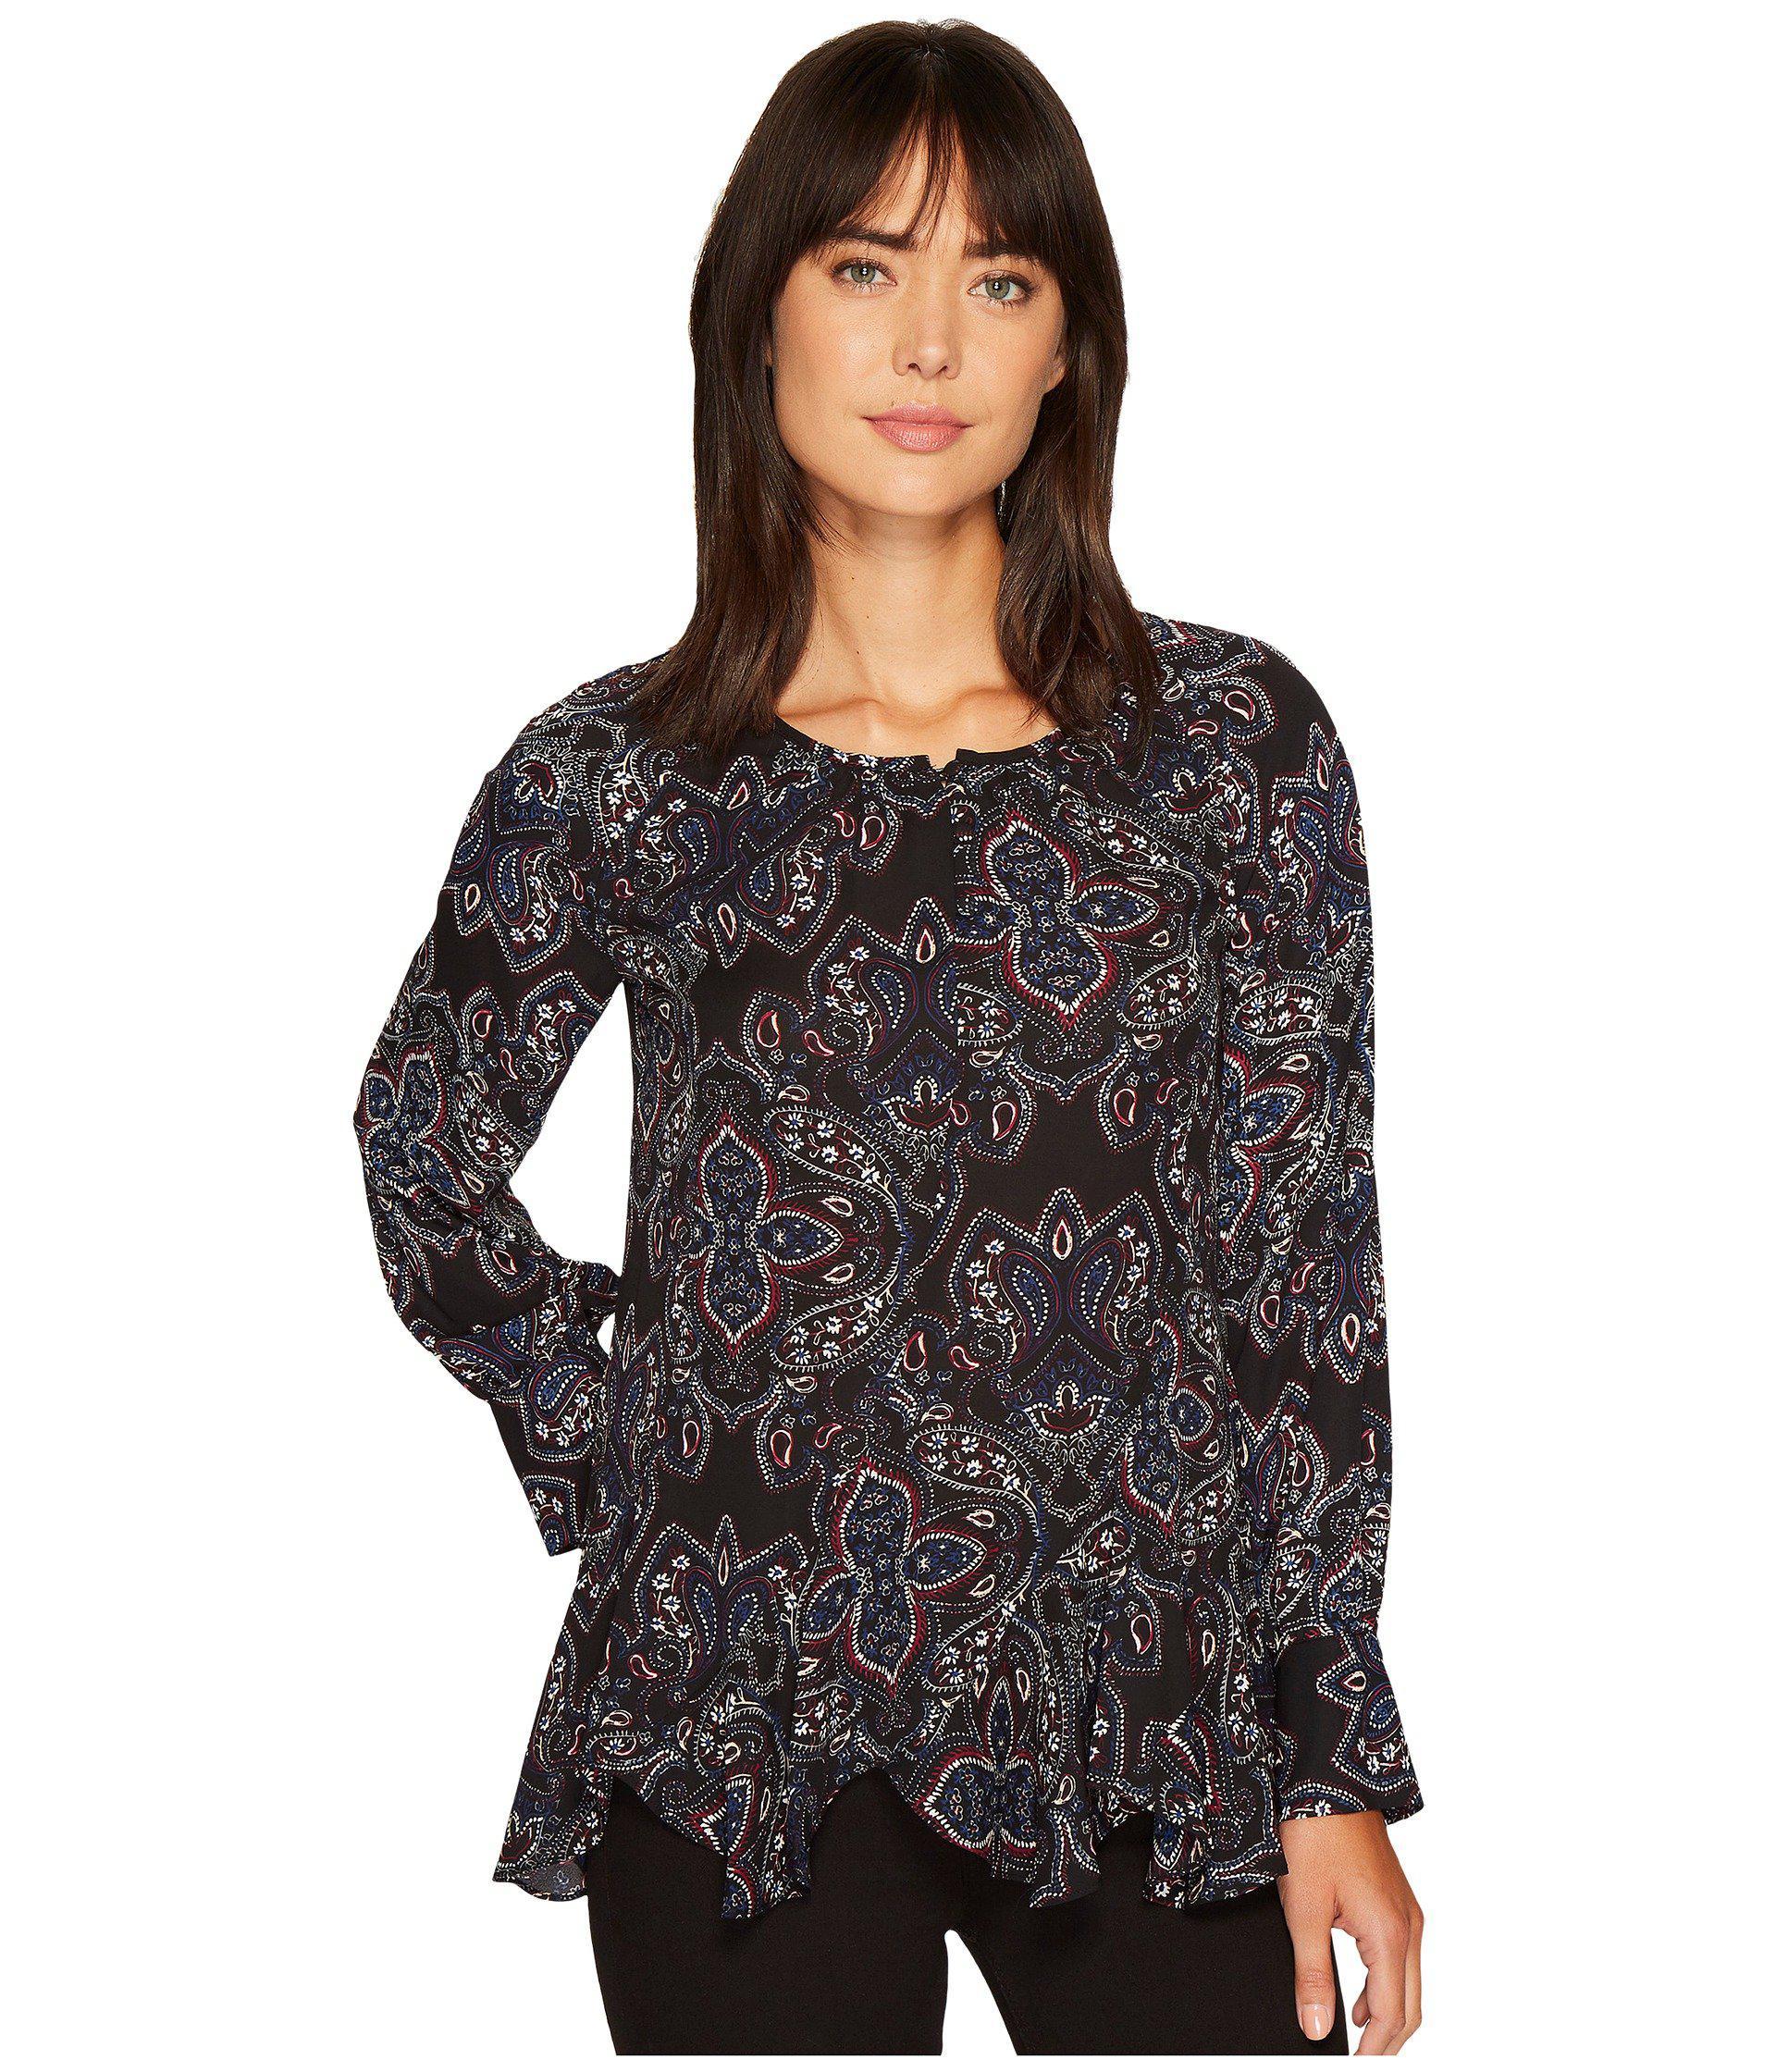 68a04601e08e9 Lyst - Ivanka Trump Printed Woven Long Sleeve Blouse in Black - Save 51%